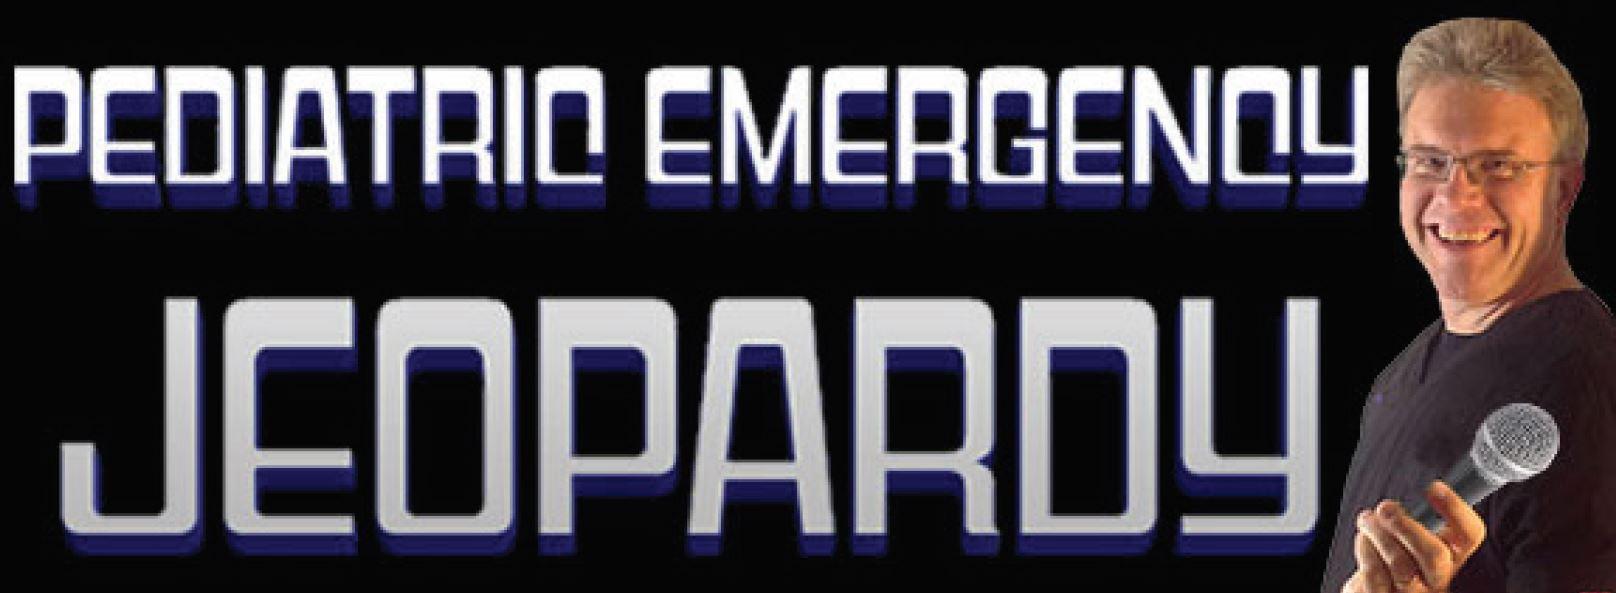 ED- 2018.10.19- Peds Emergency Jeopardy.JPG